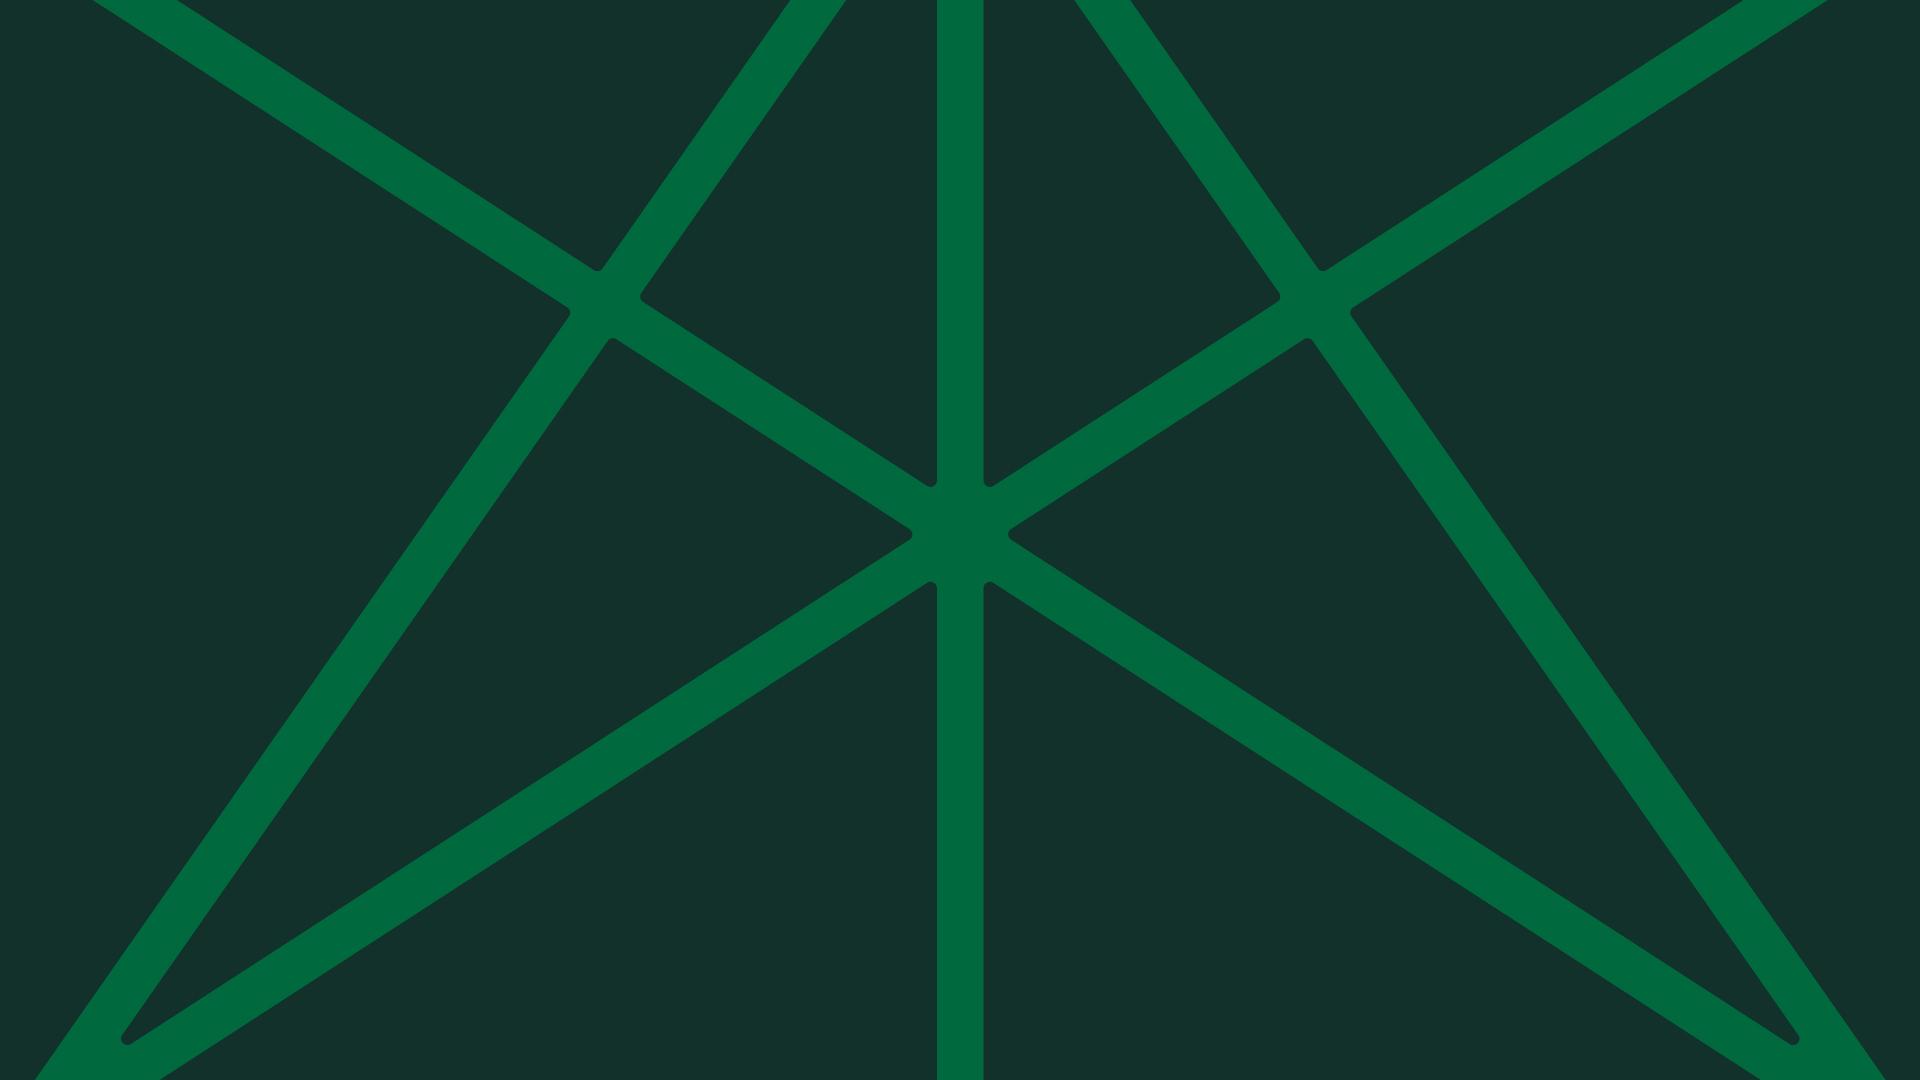 Dartmouth Green Zoom Background